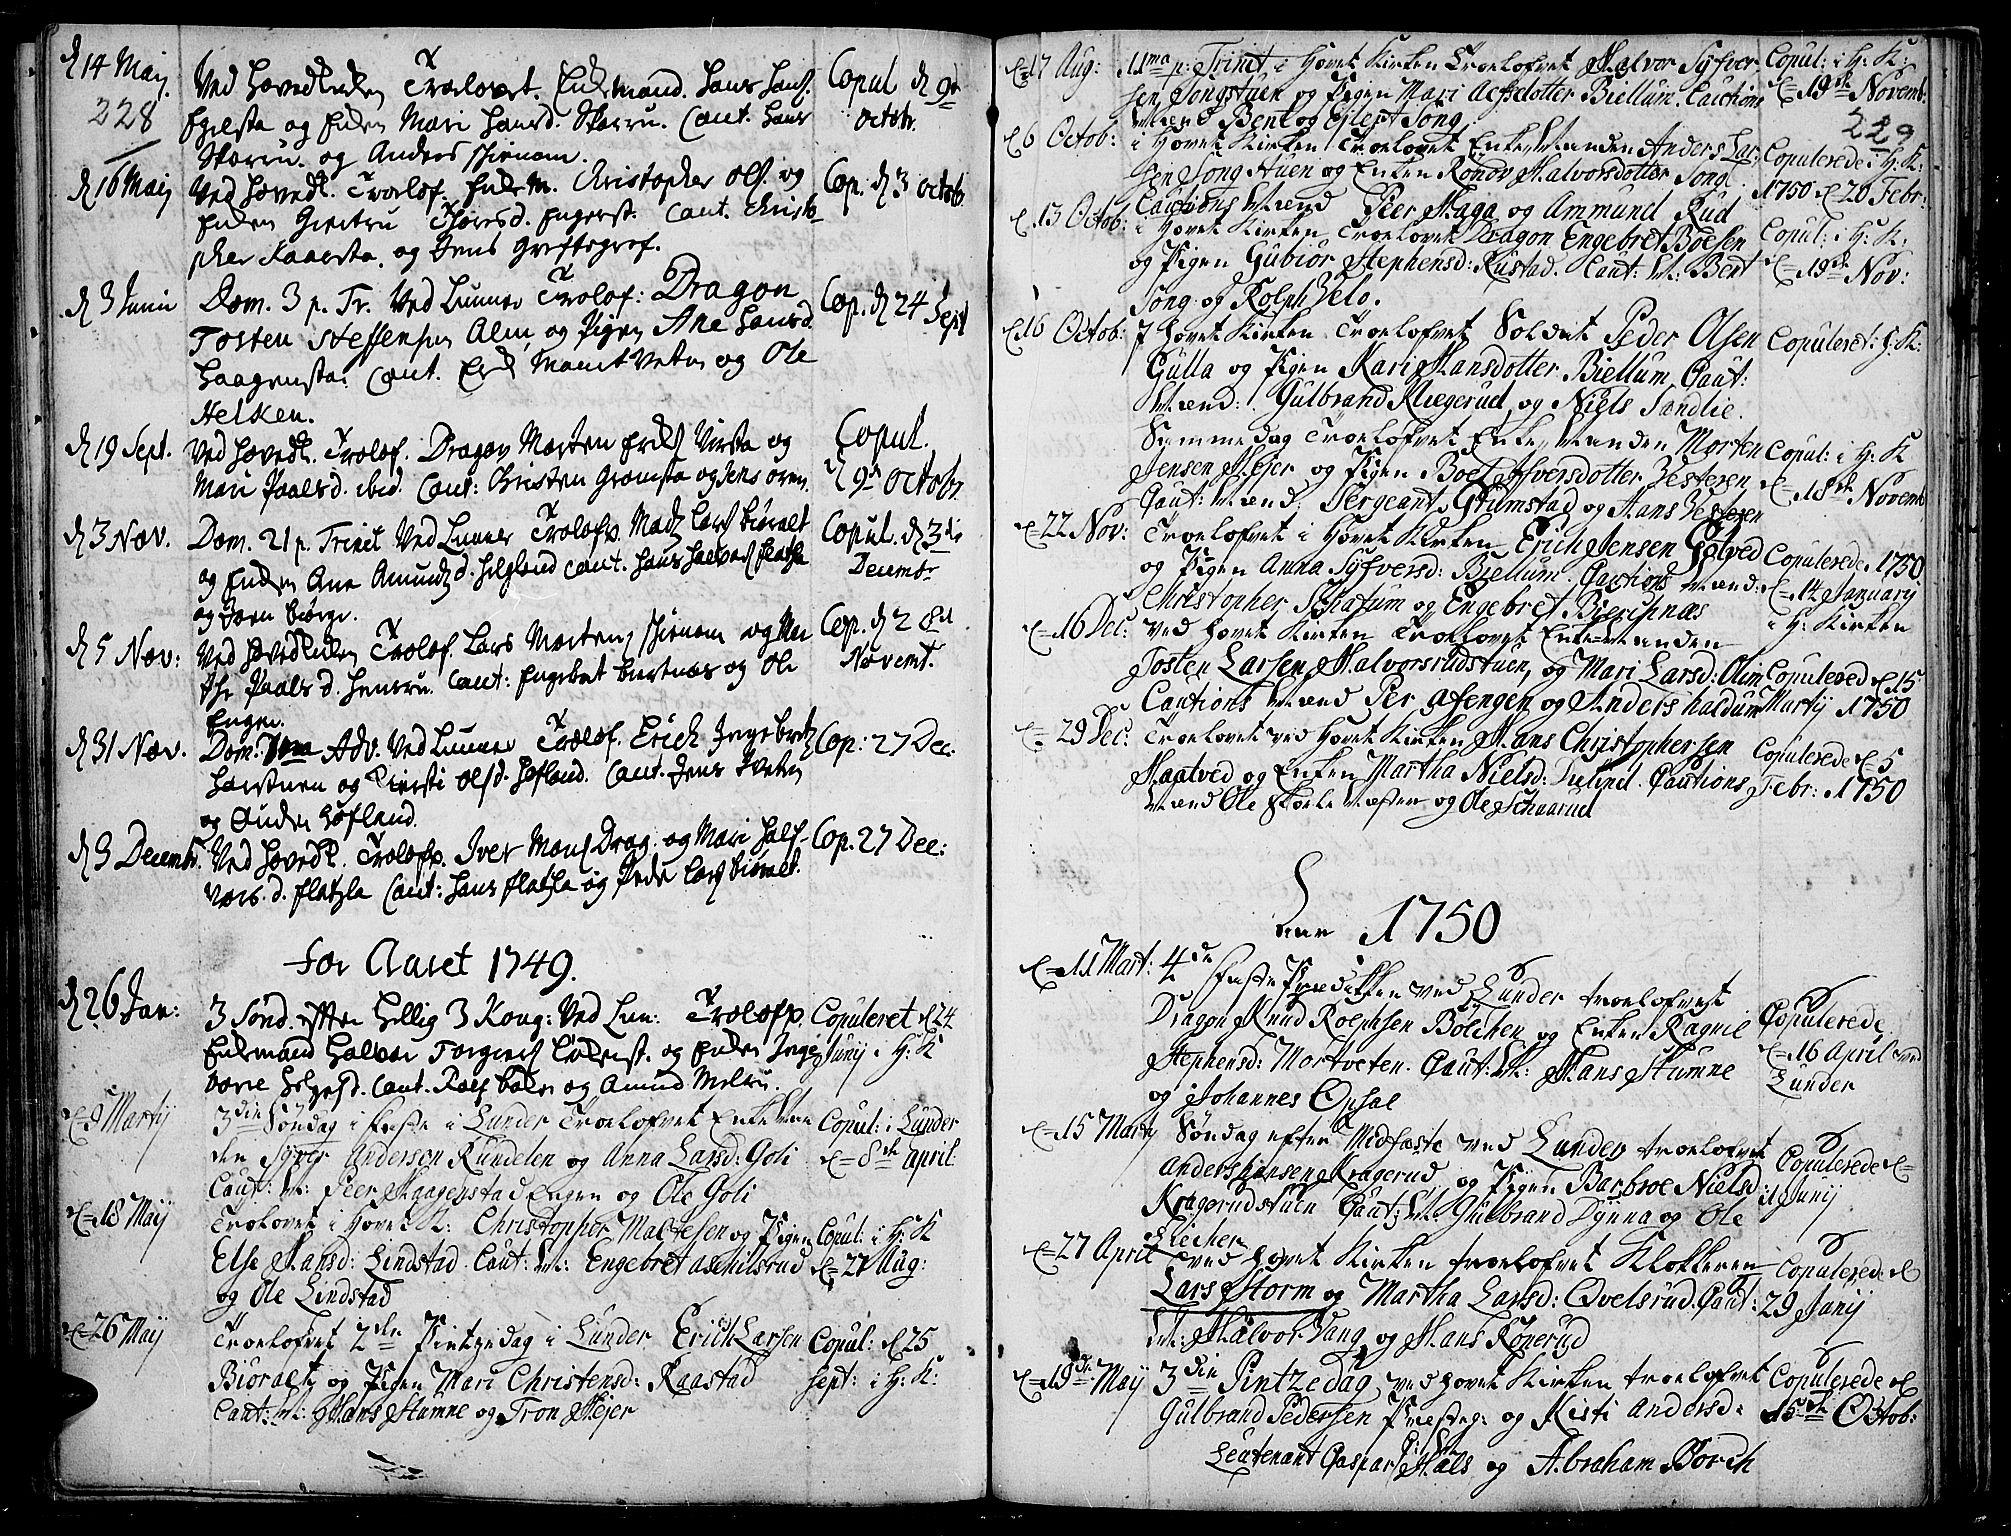 SAH, Jevnaker prestekontor, Ministerialbok nr. 2, 1725-1751, s. 228-229